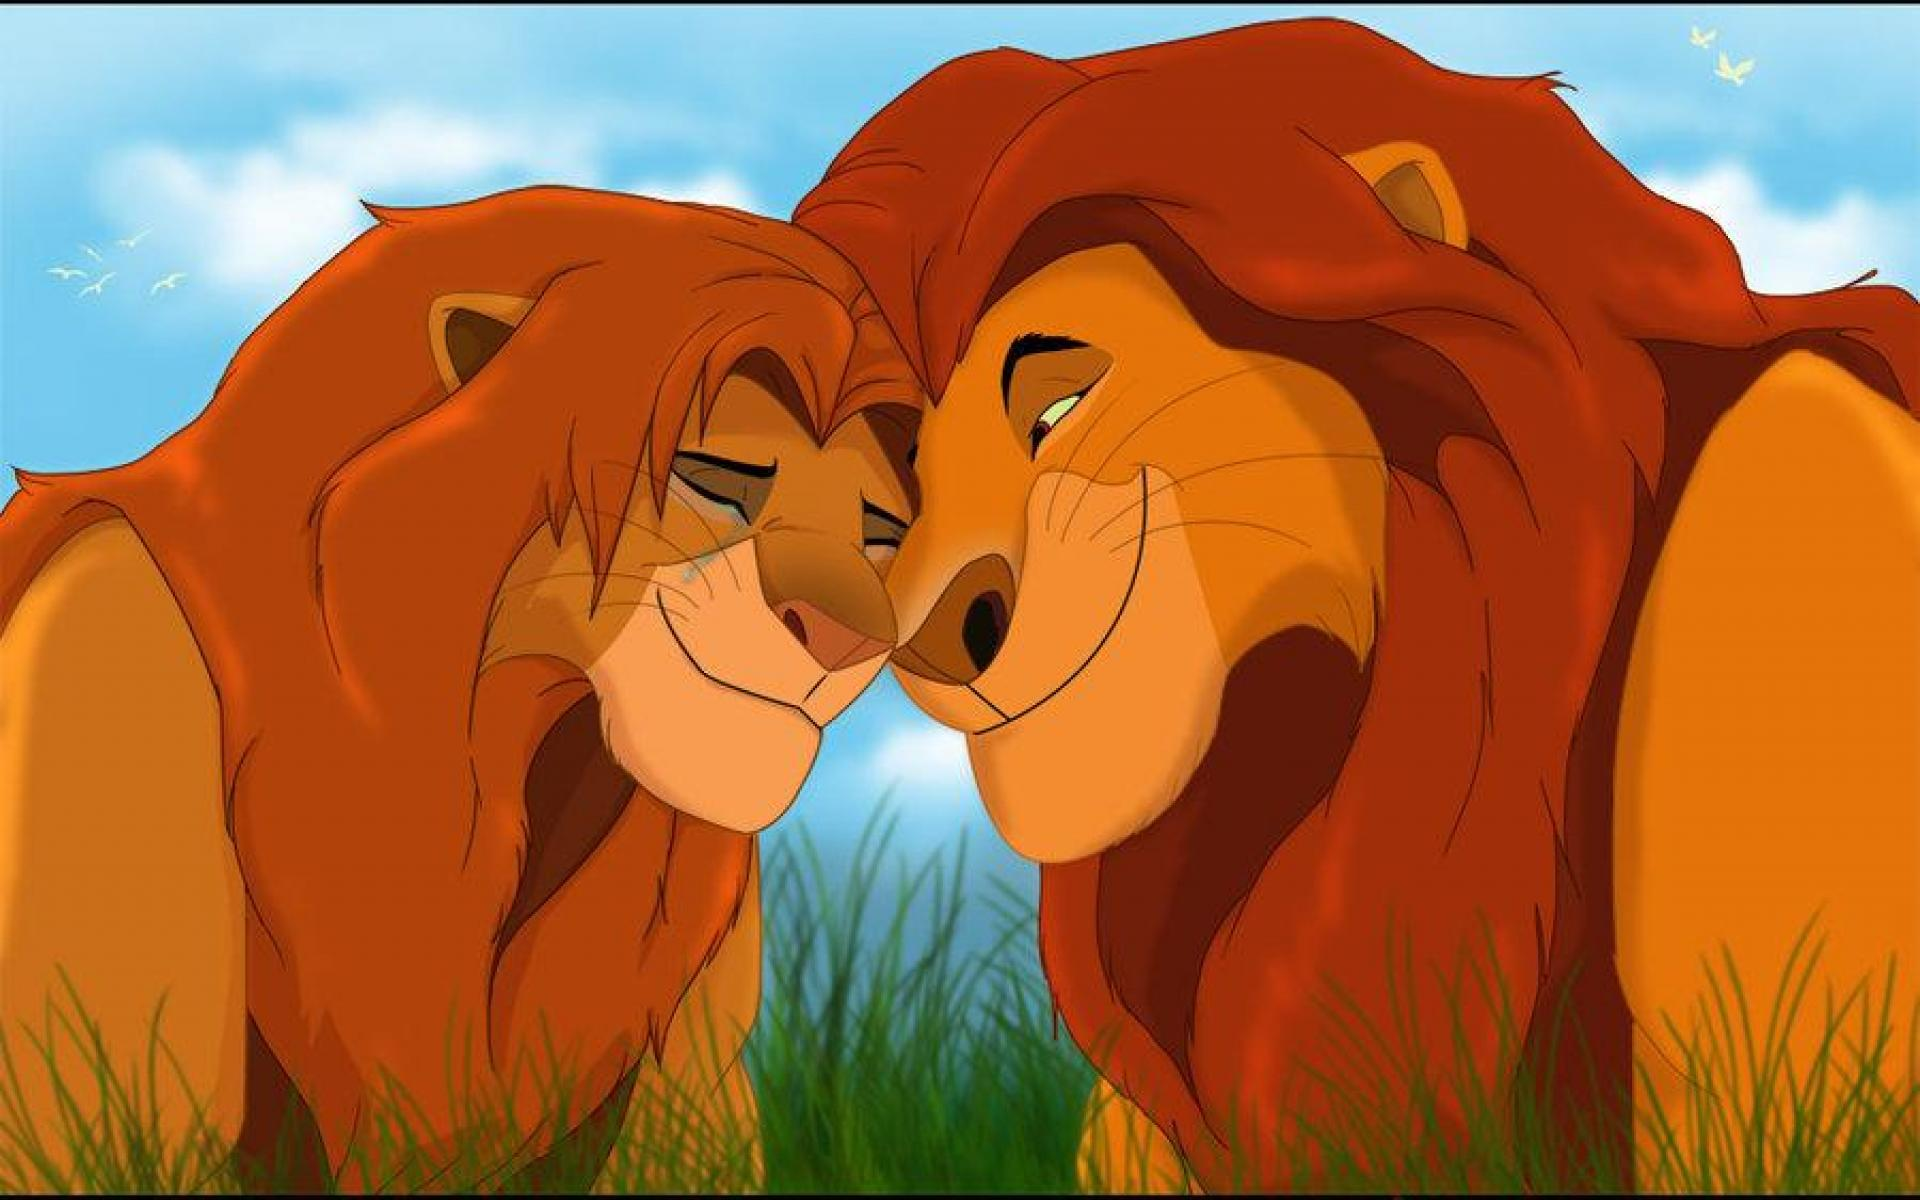 Wallpaper Tags: and simba king the lion